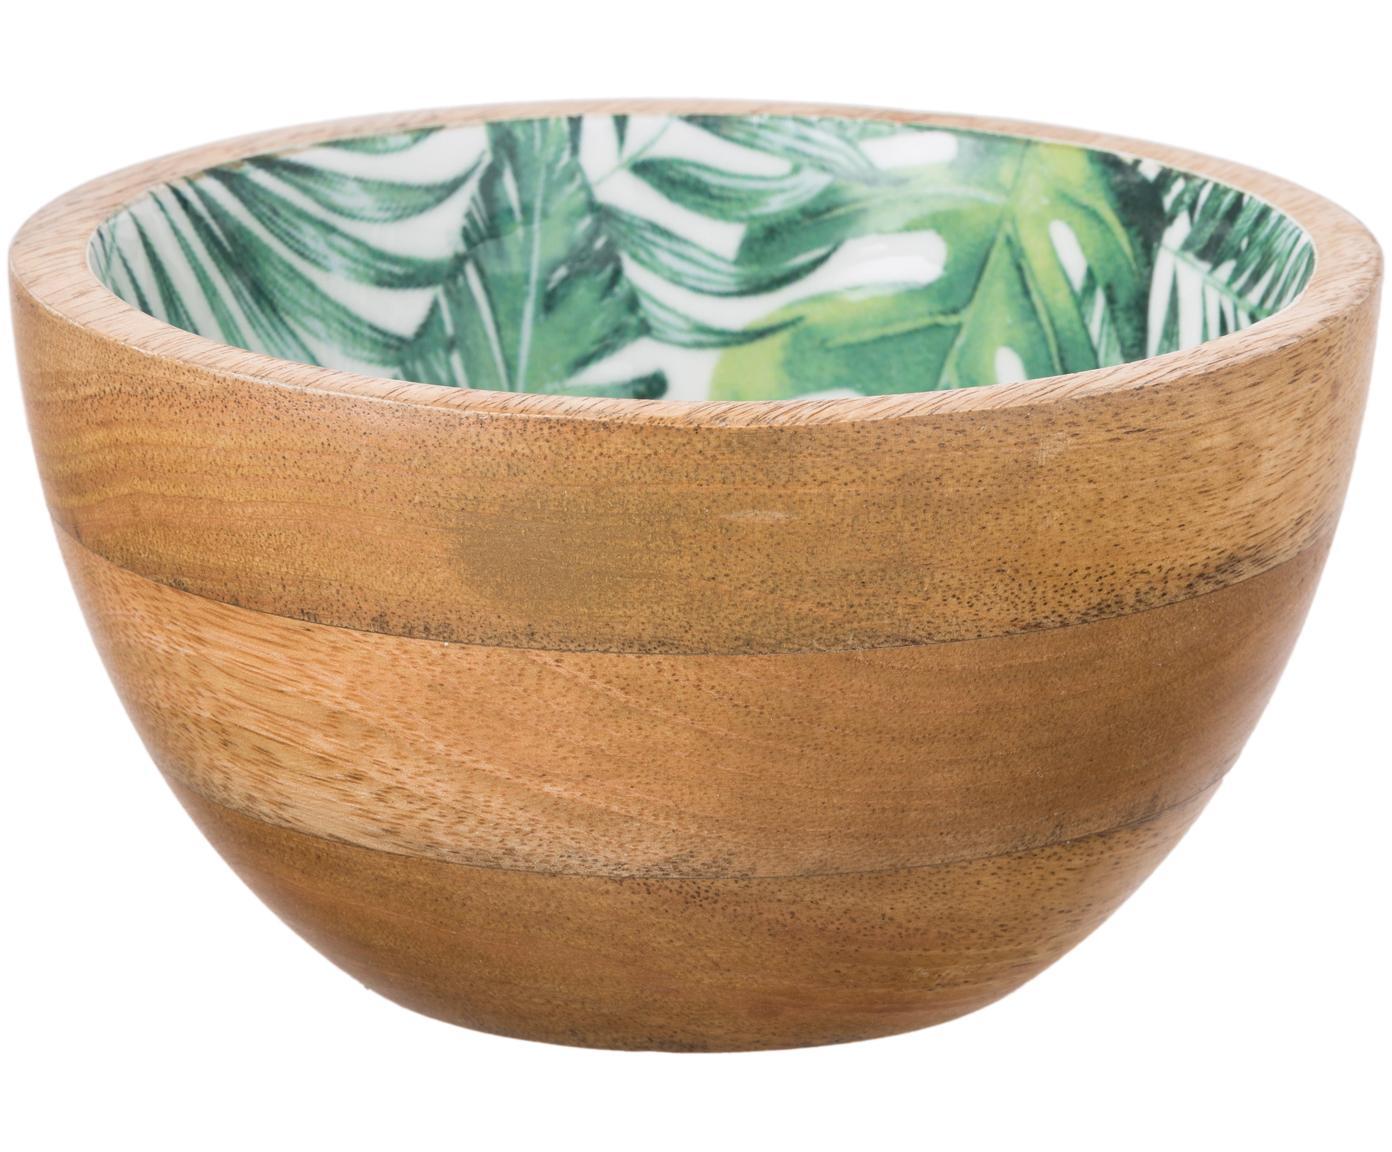 Mangoholz-Schälchen Alina mit tropischem Motiv, Mangoholz, Mangoholz, Grün, Weiß, Ø 16 x H 9 cm